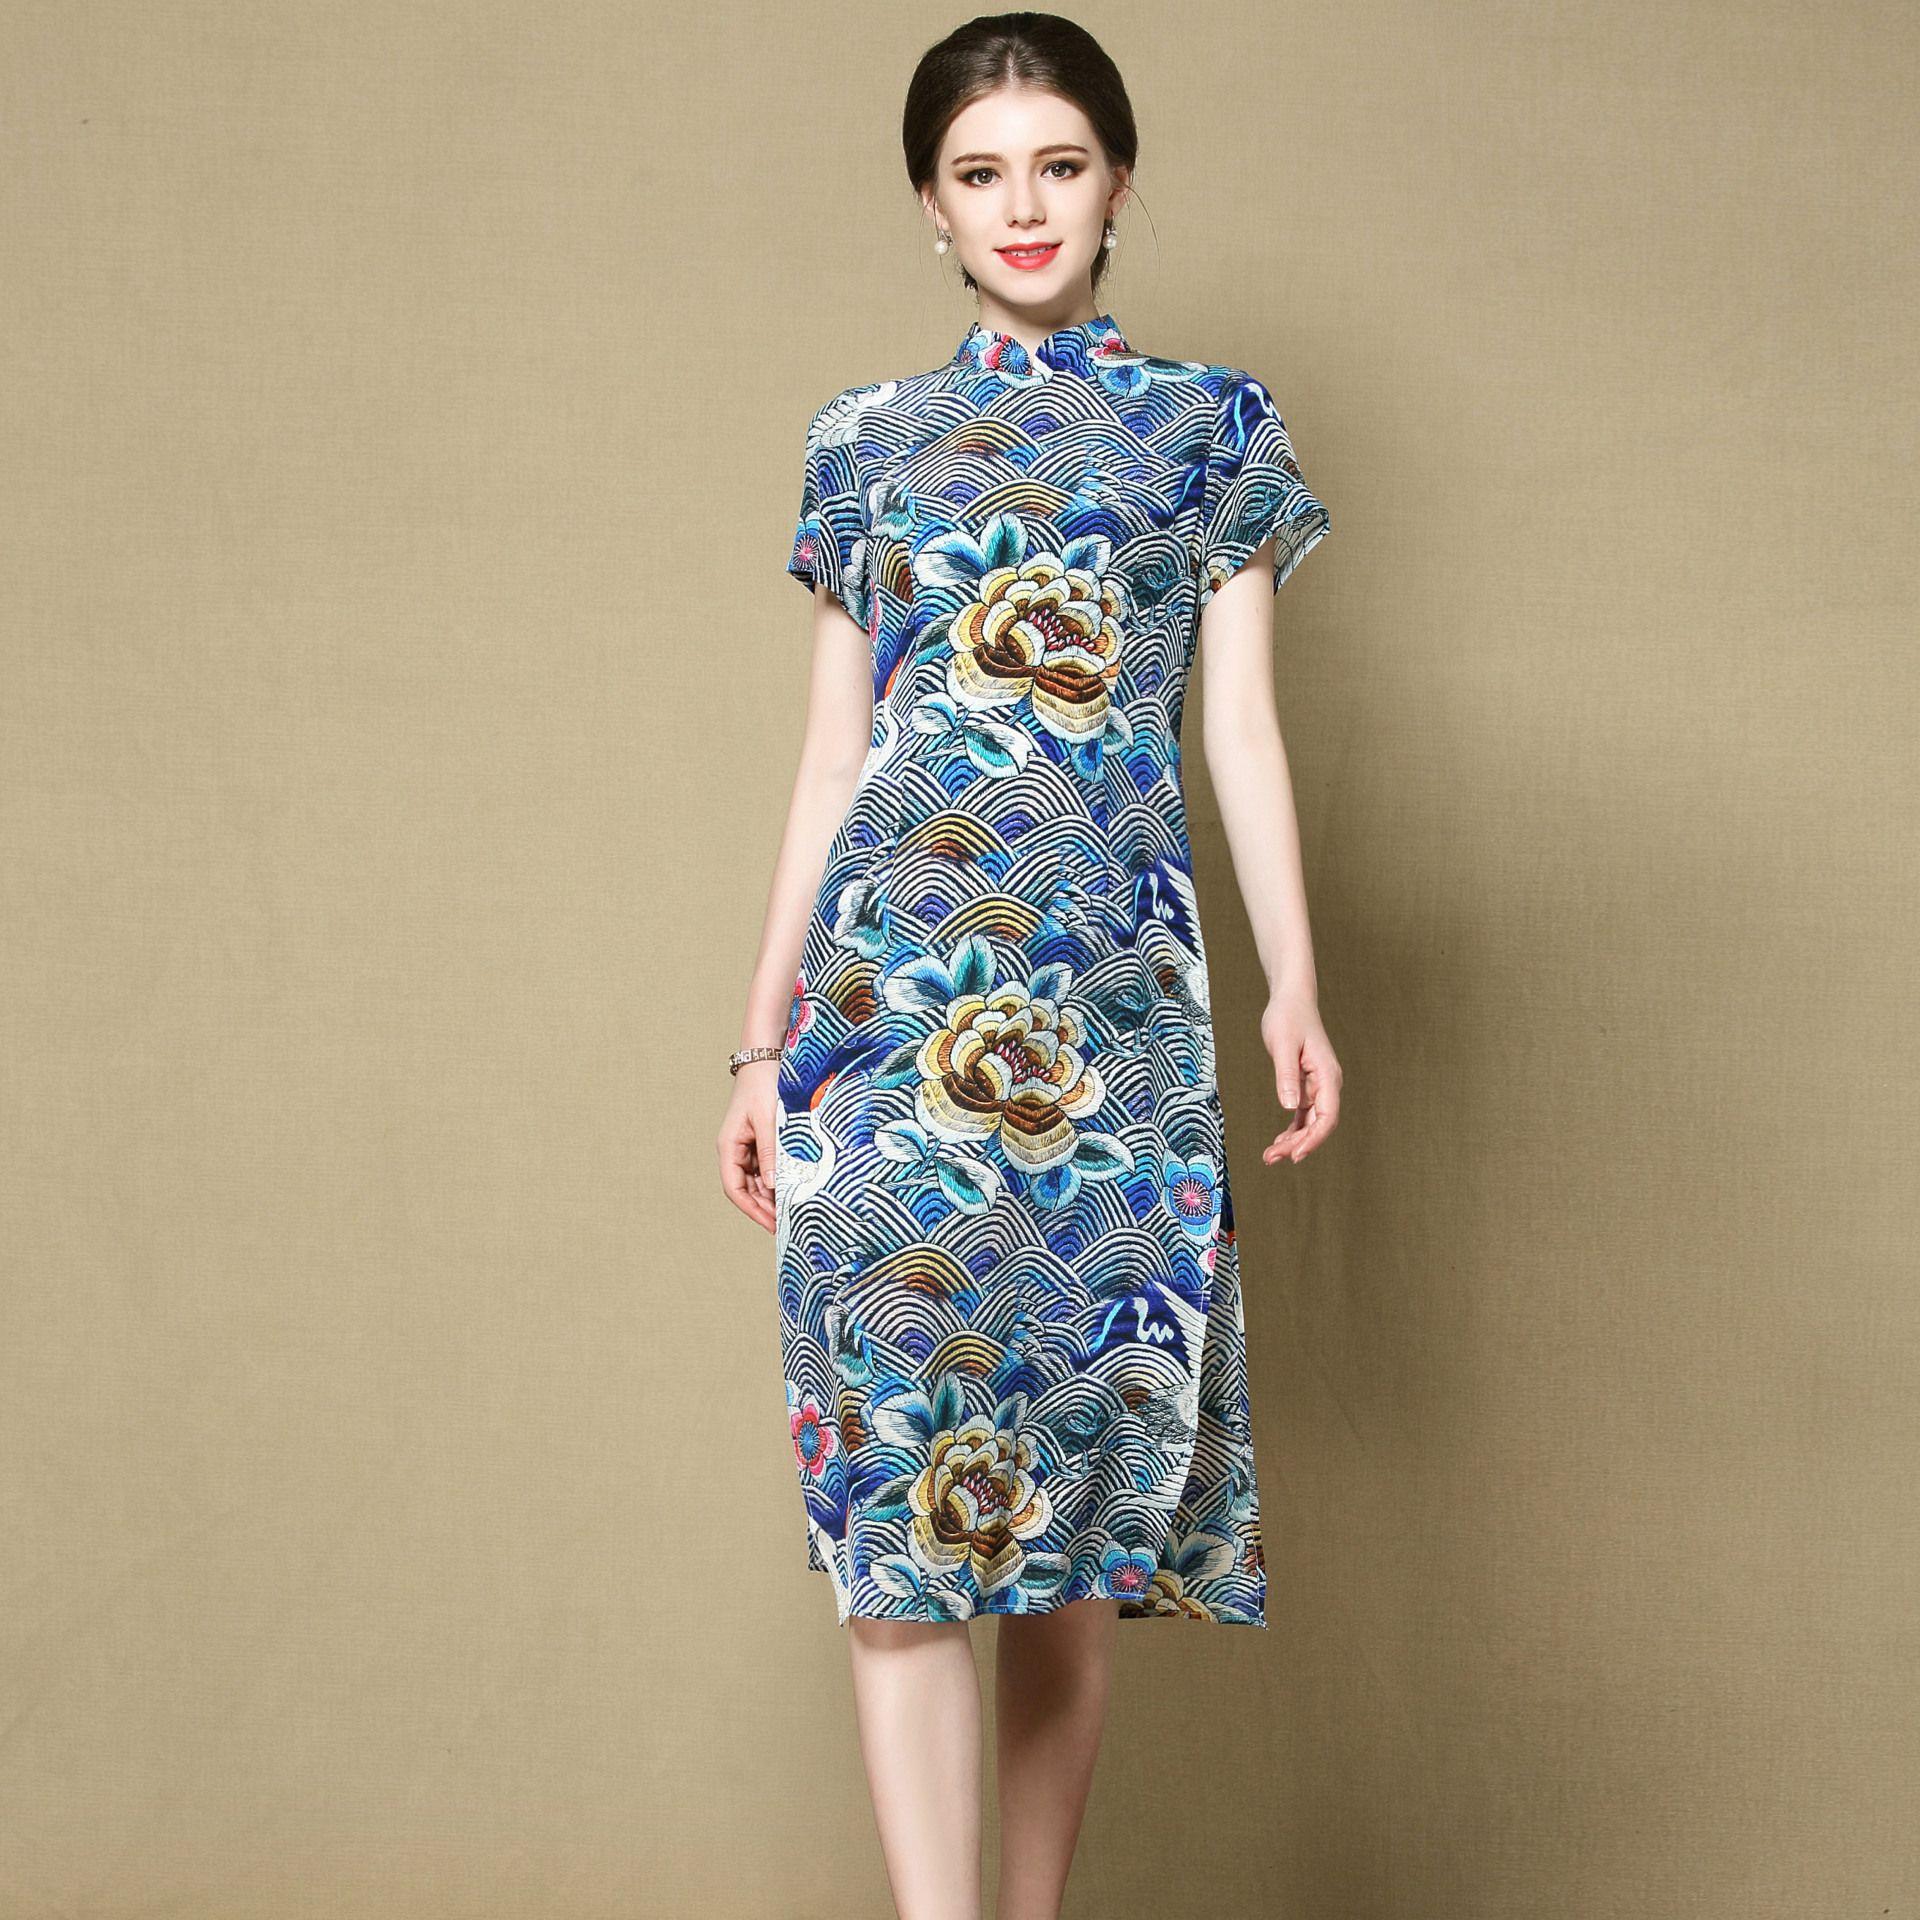 Engaging Floral Print Silk Cheongsam Qipao Dress